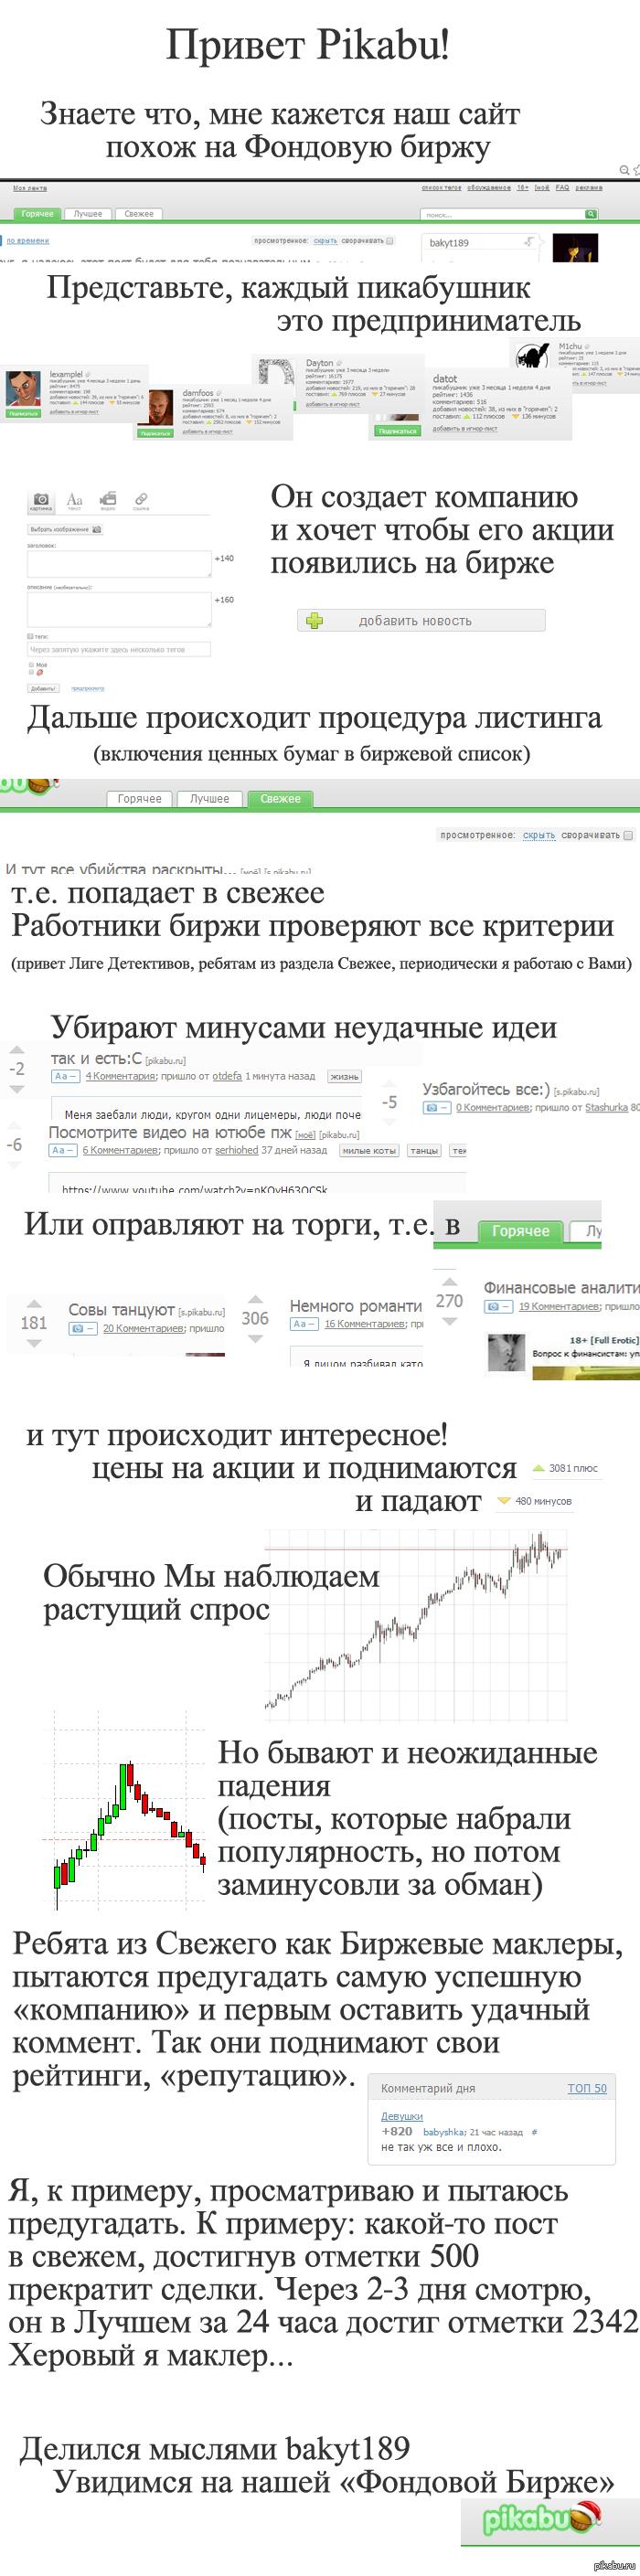 Анализ рынка фокусников - форд - группа - форекс рбк форекс тв онлайн